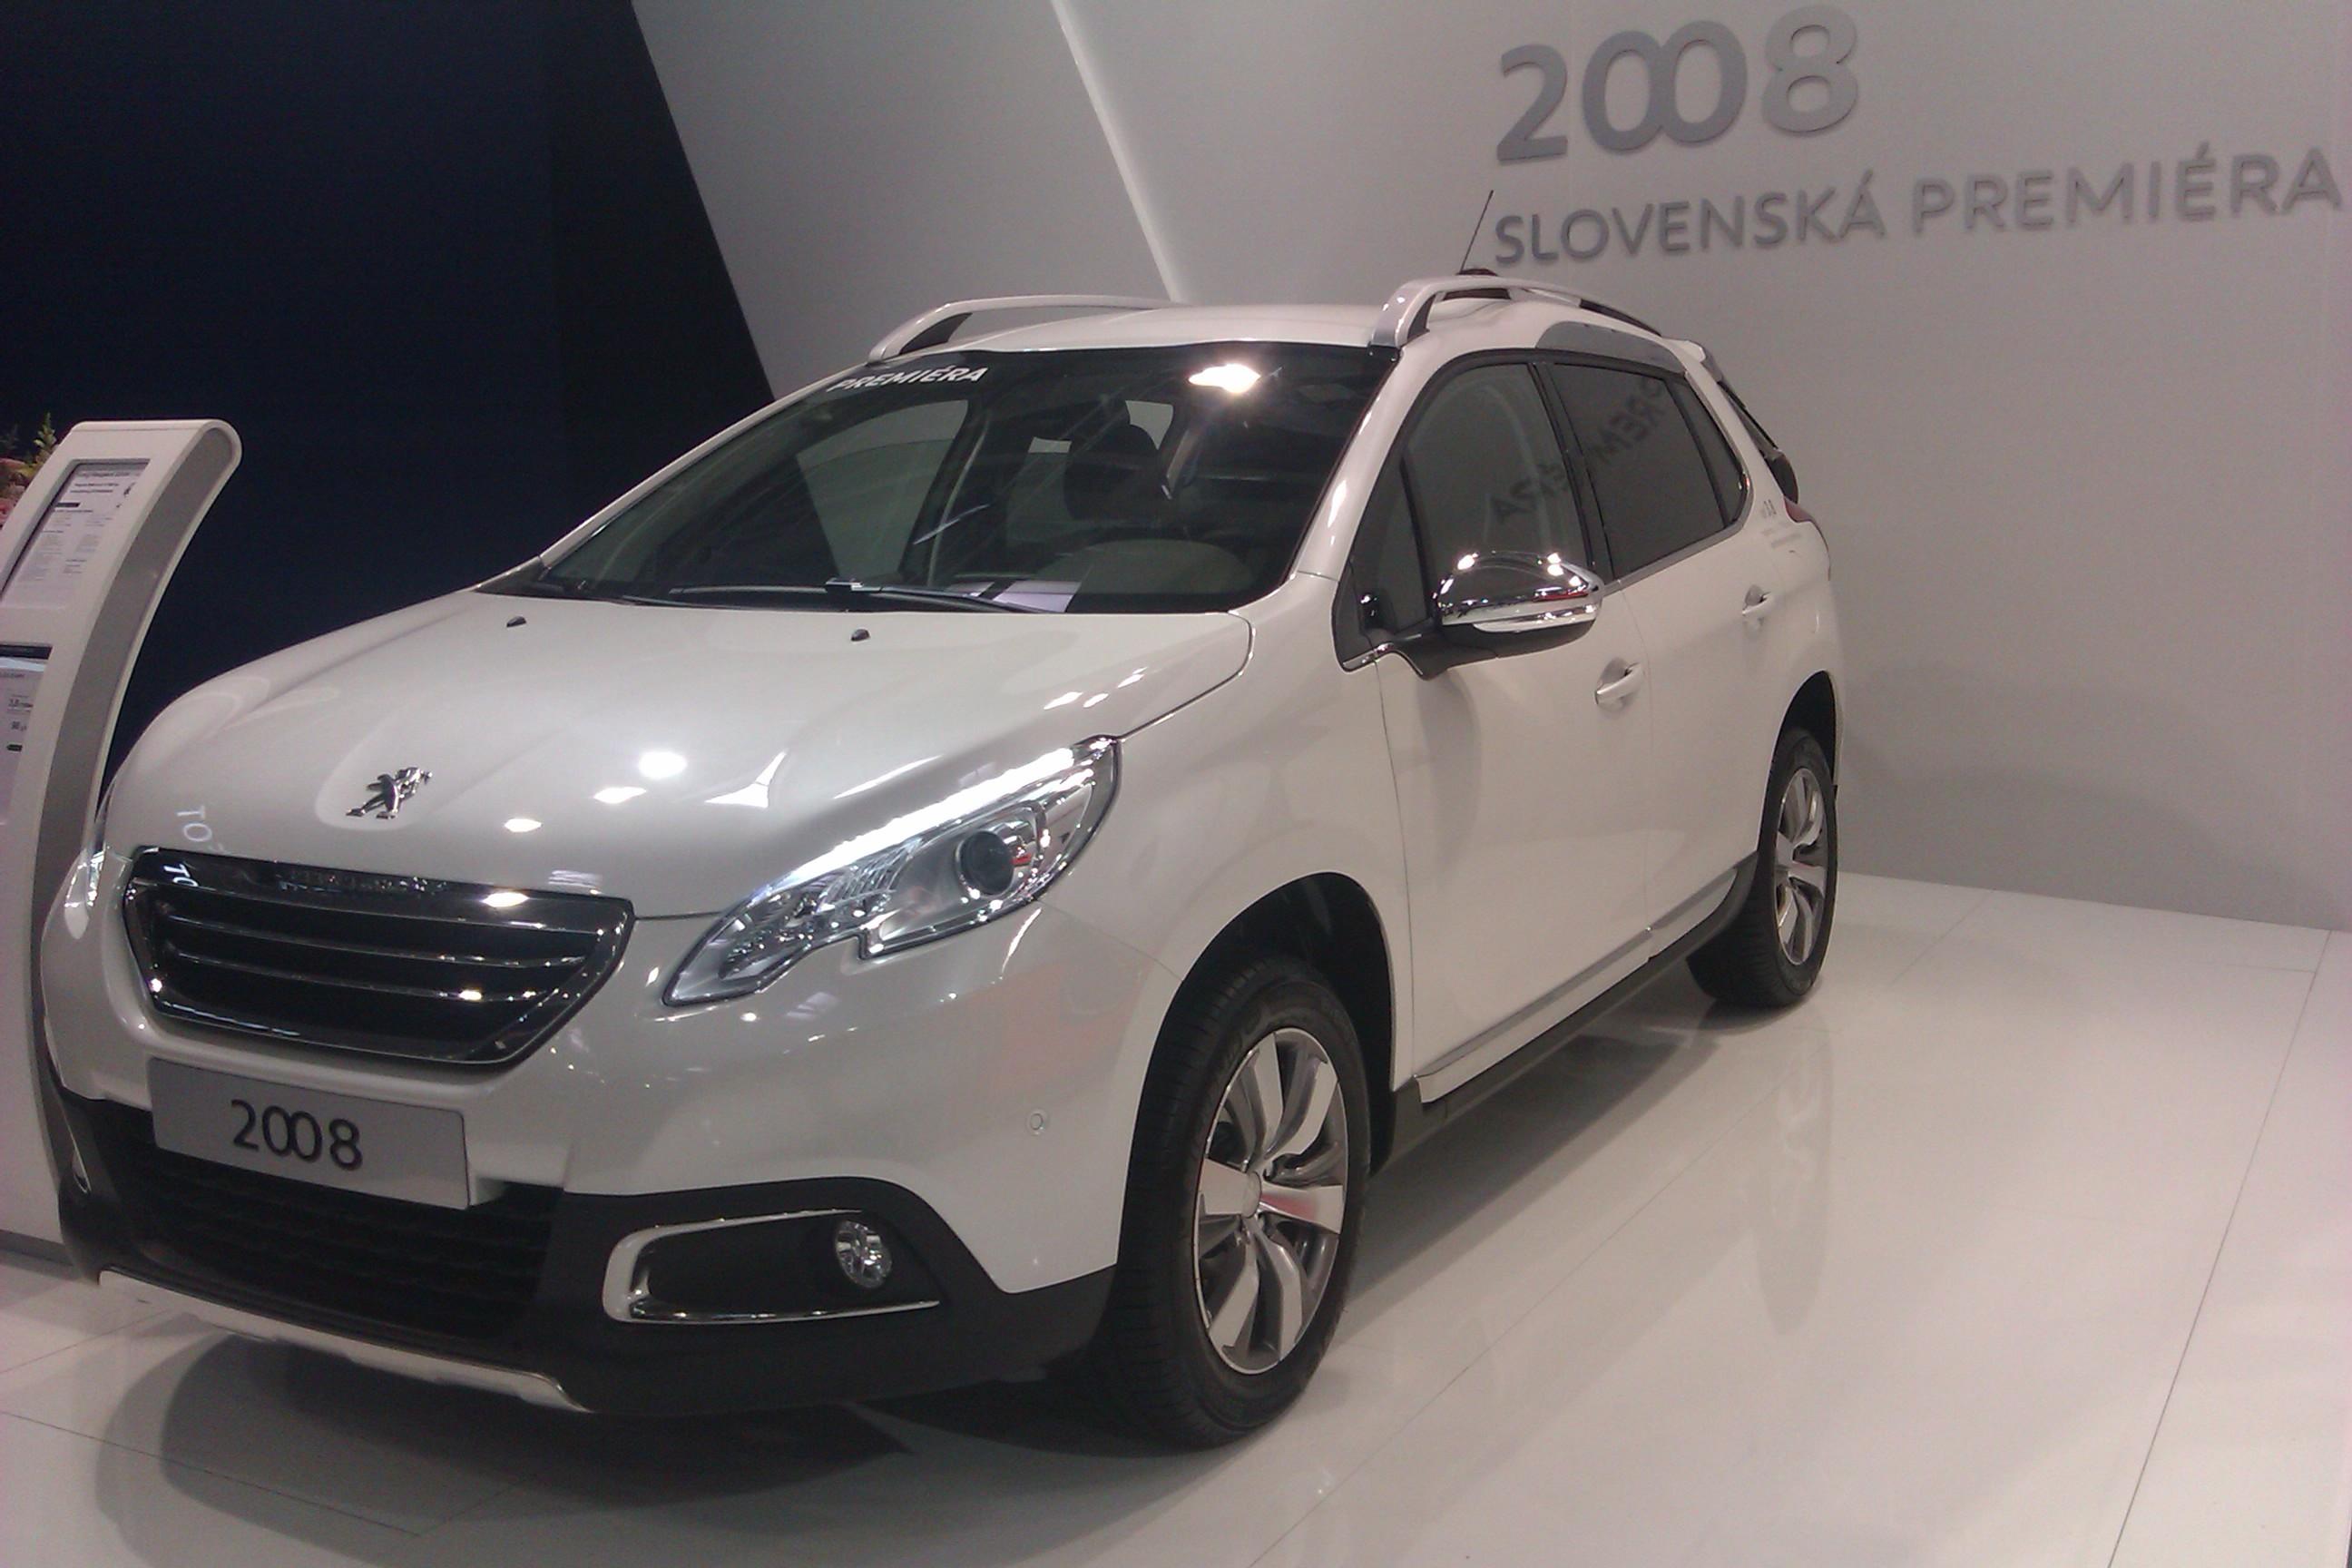 Peugeot 2008 - slovenská premiéra